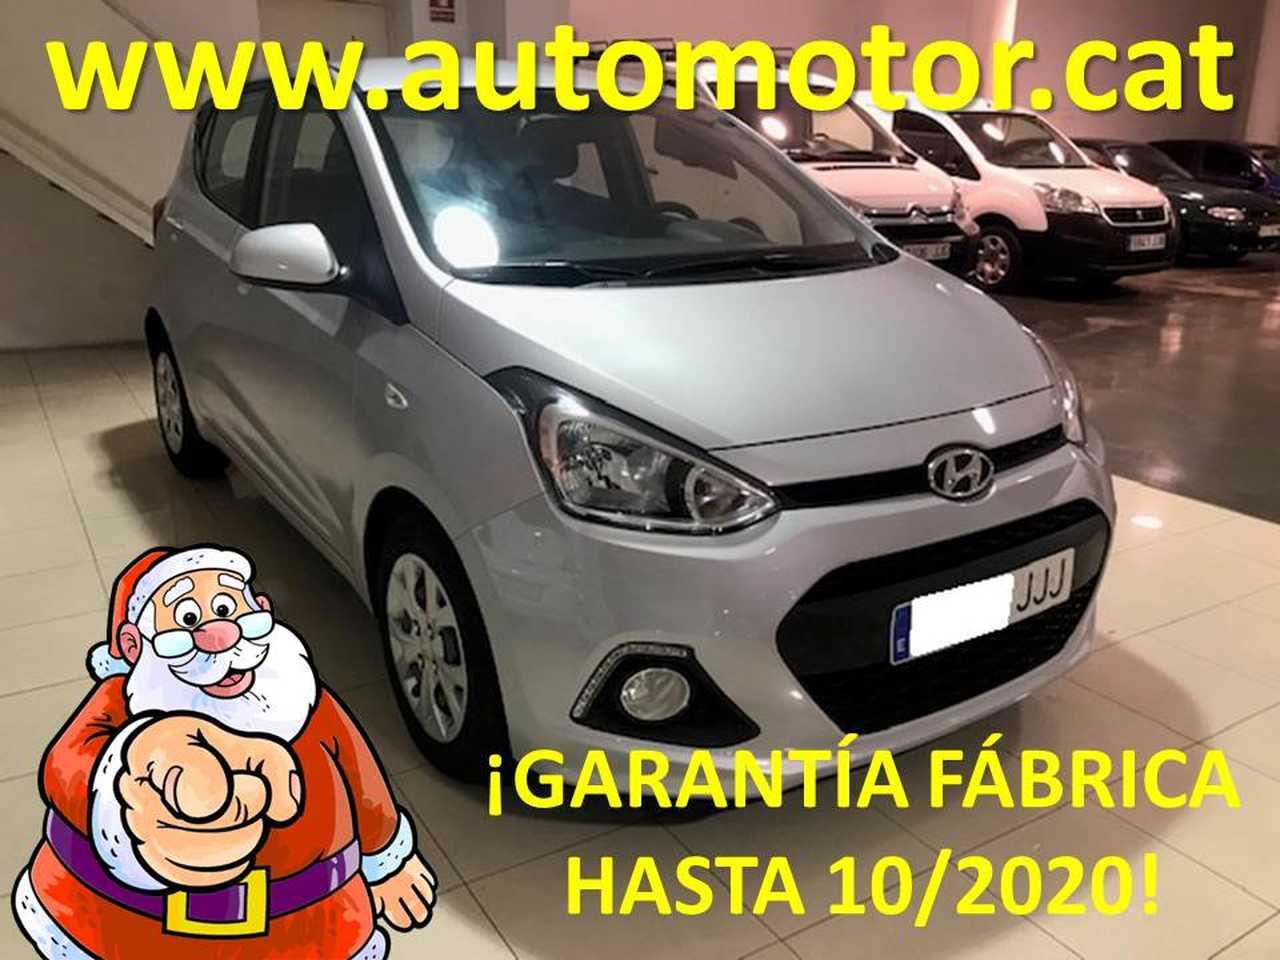 Hyundai i10 1.0 Tecno Blue - GARANTIA FABRICA HASTA 10/2020  - Foto 1